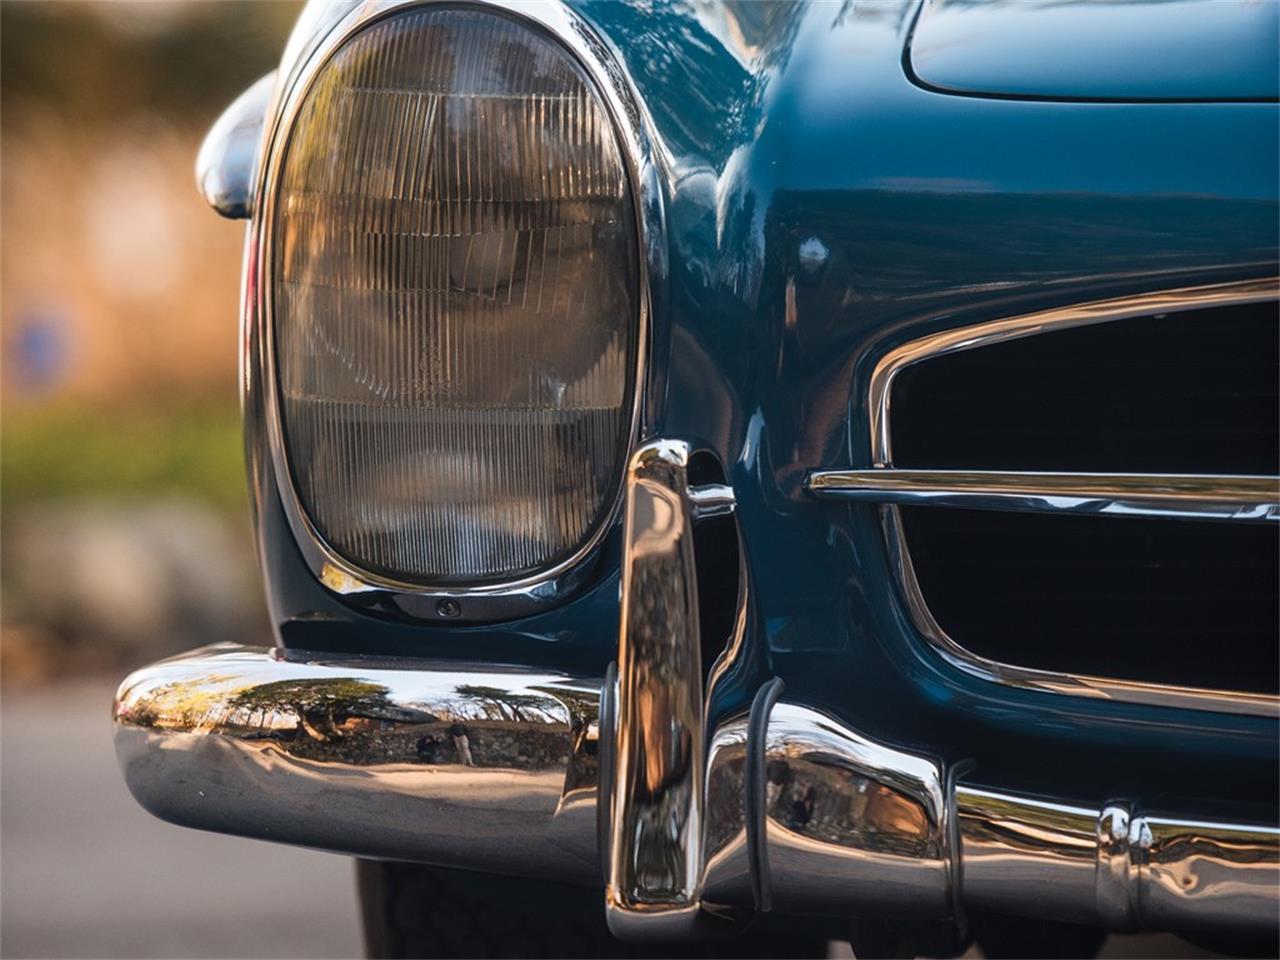 1962 Mercedes-Benz 300SL Roadster (CC-1070225) for sale in Fort Lauderdale, Florida